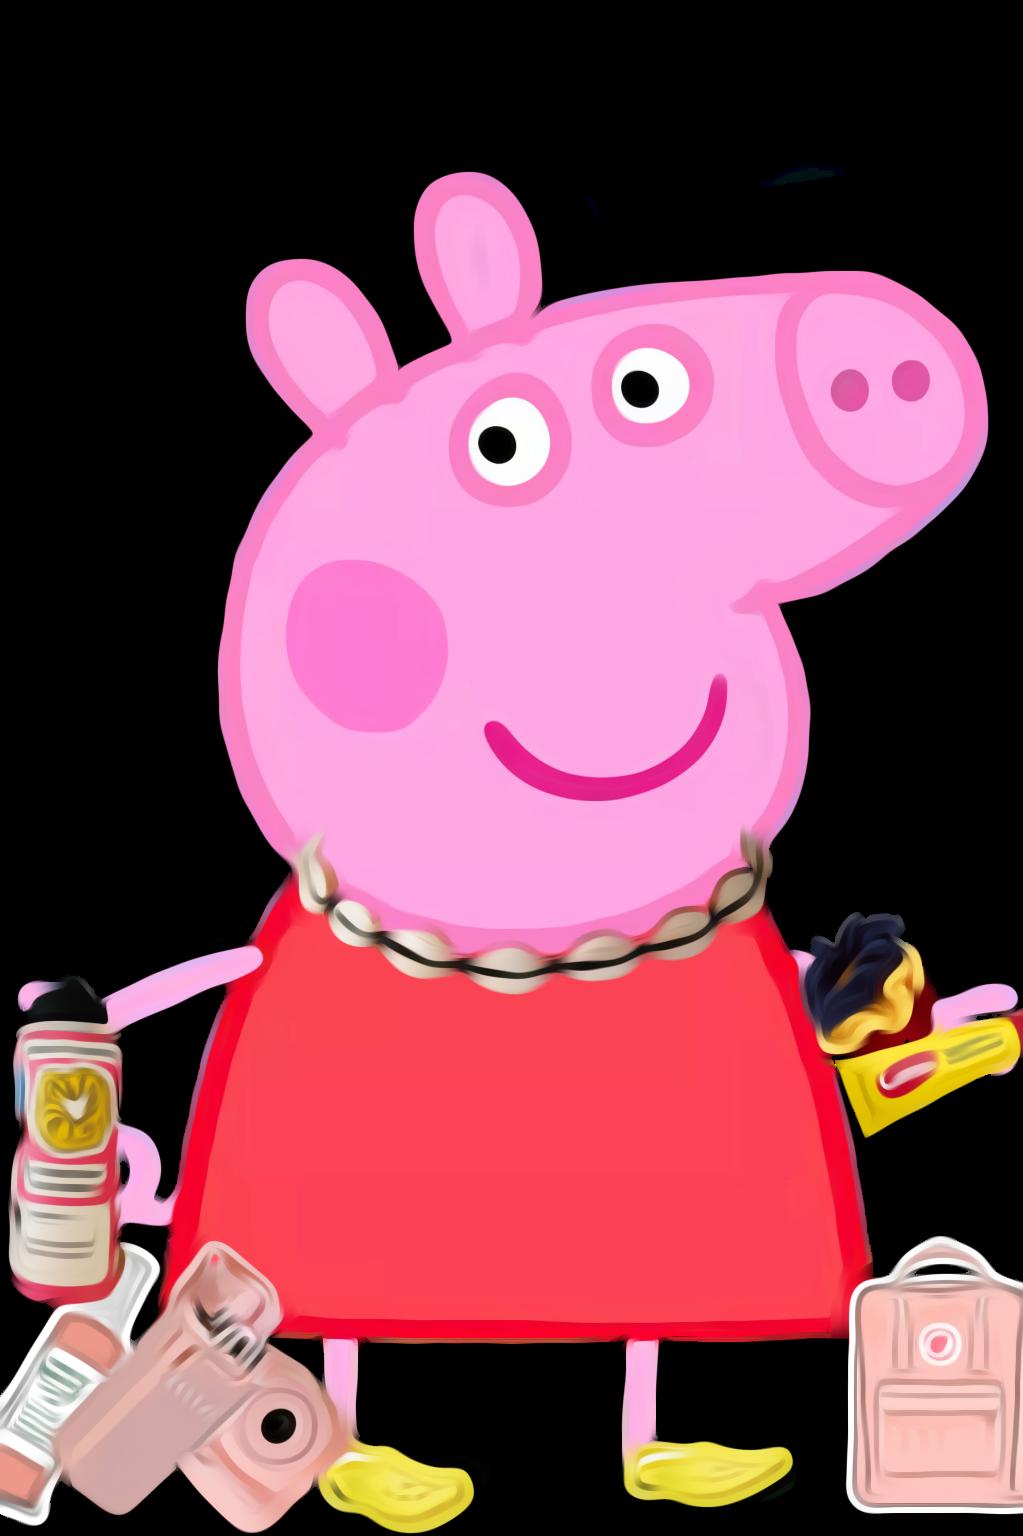 Peppa Pig Wallpaper Peppa Pig Meme